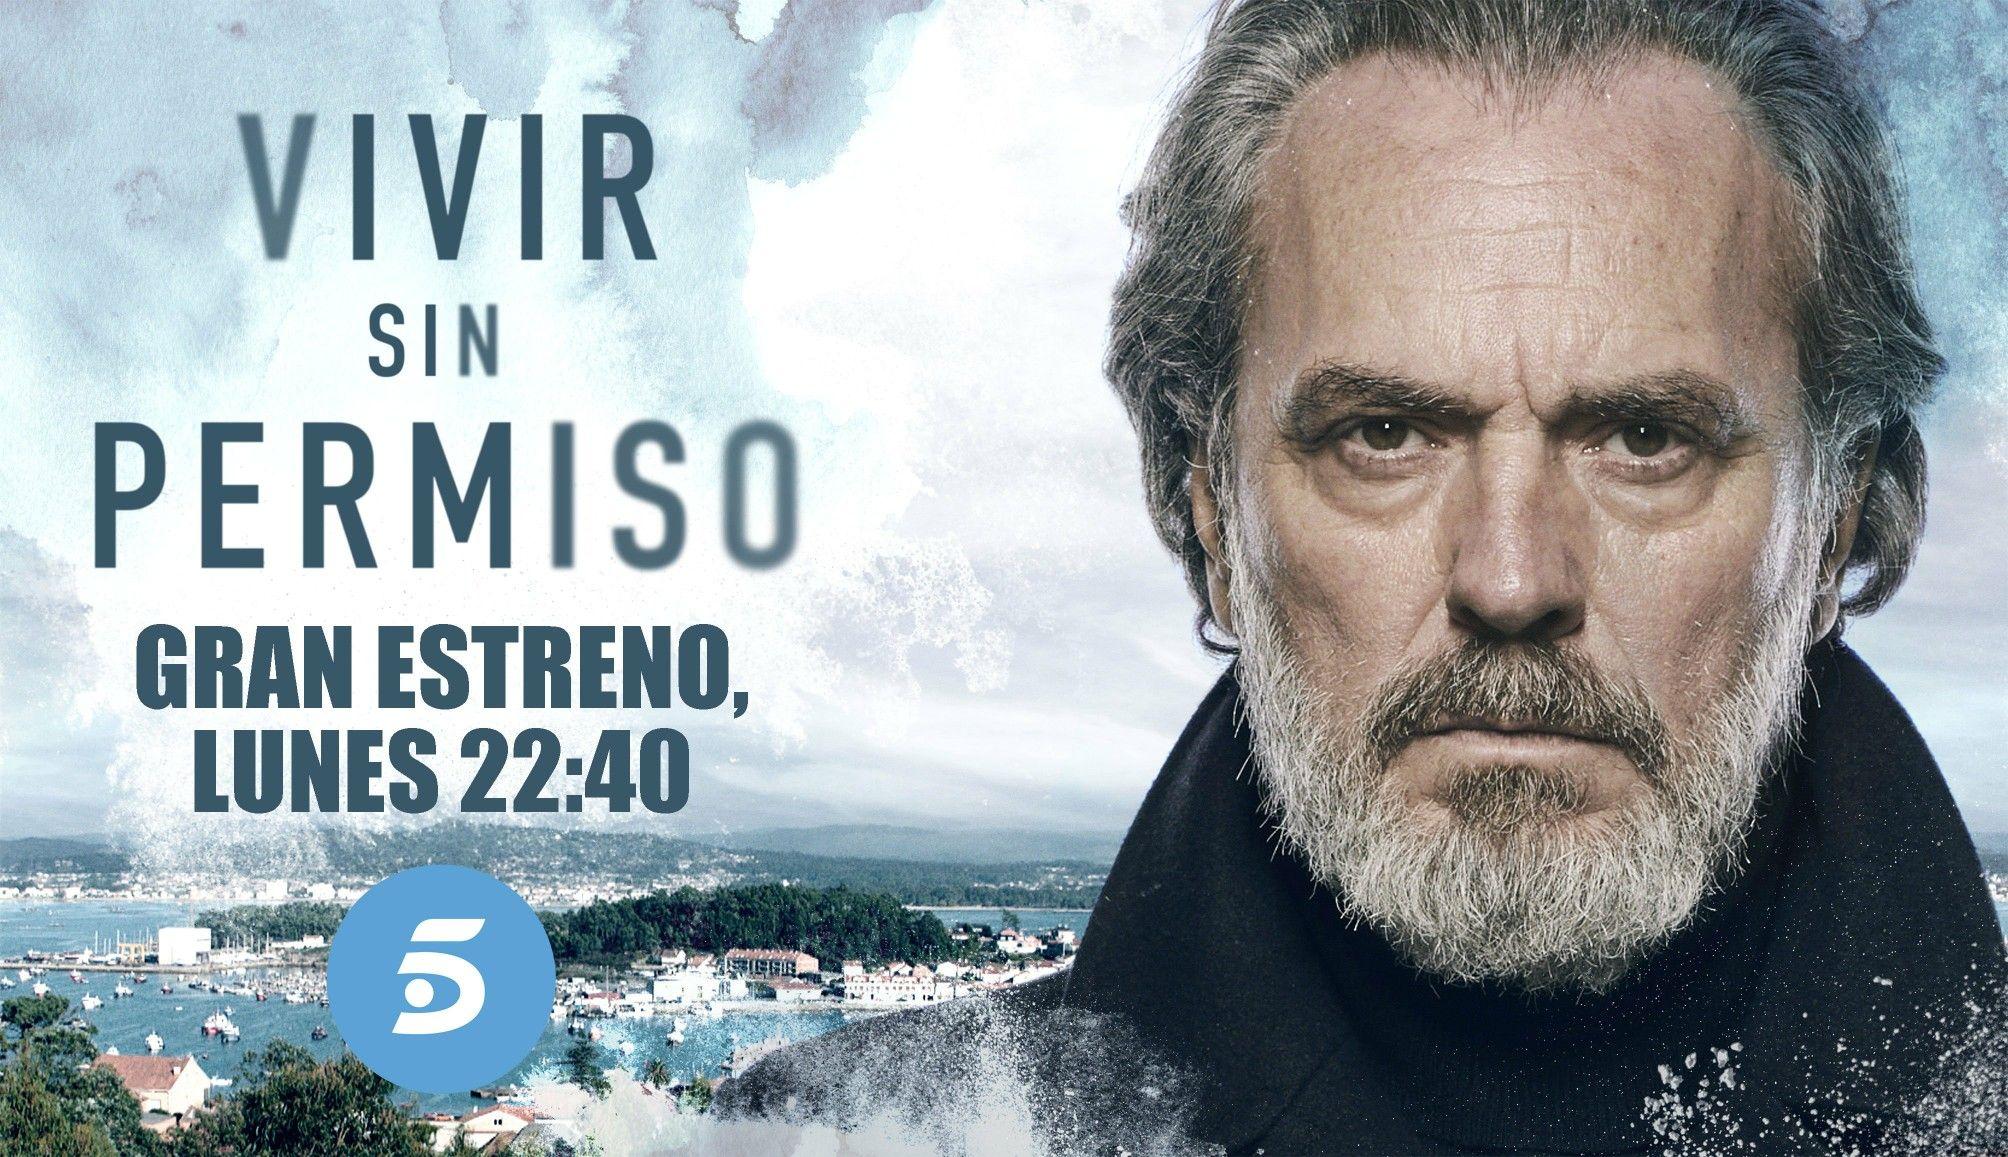 Vivir Sin Permiso Serie Tv Series Español Series Series De Tv